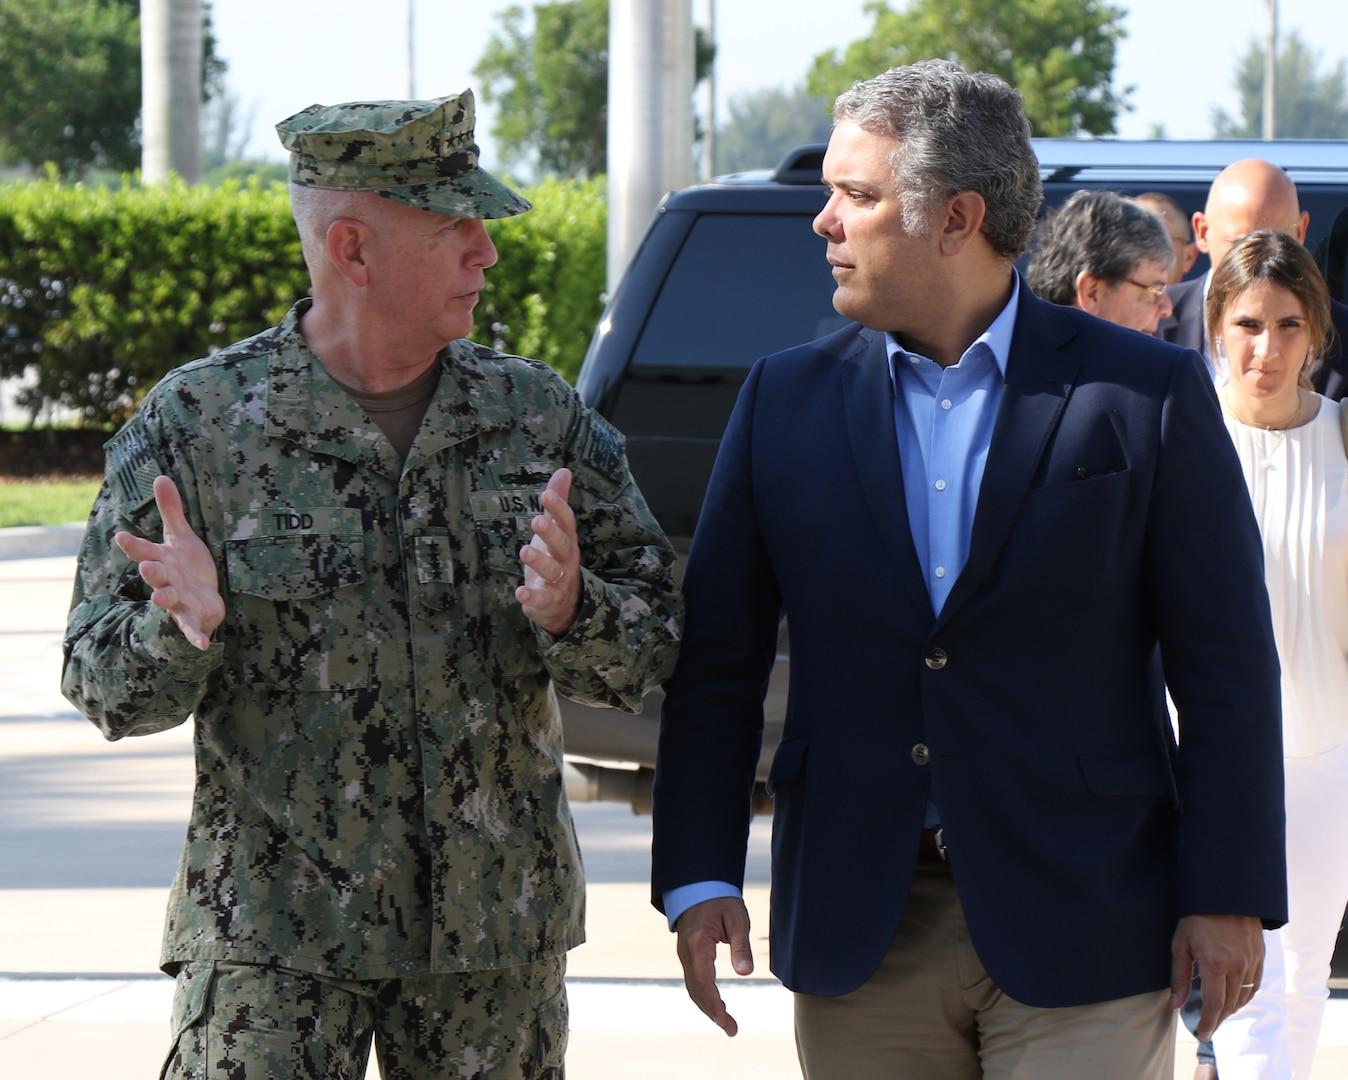 U.S. Navy Adm. Kurt Tidd, commander of U.S. Southern Command (SOUTHCOM), talks with Colombian President-elect Ivan Duque